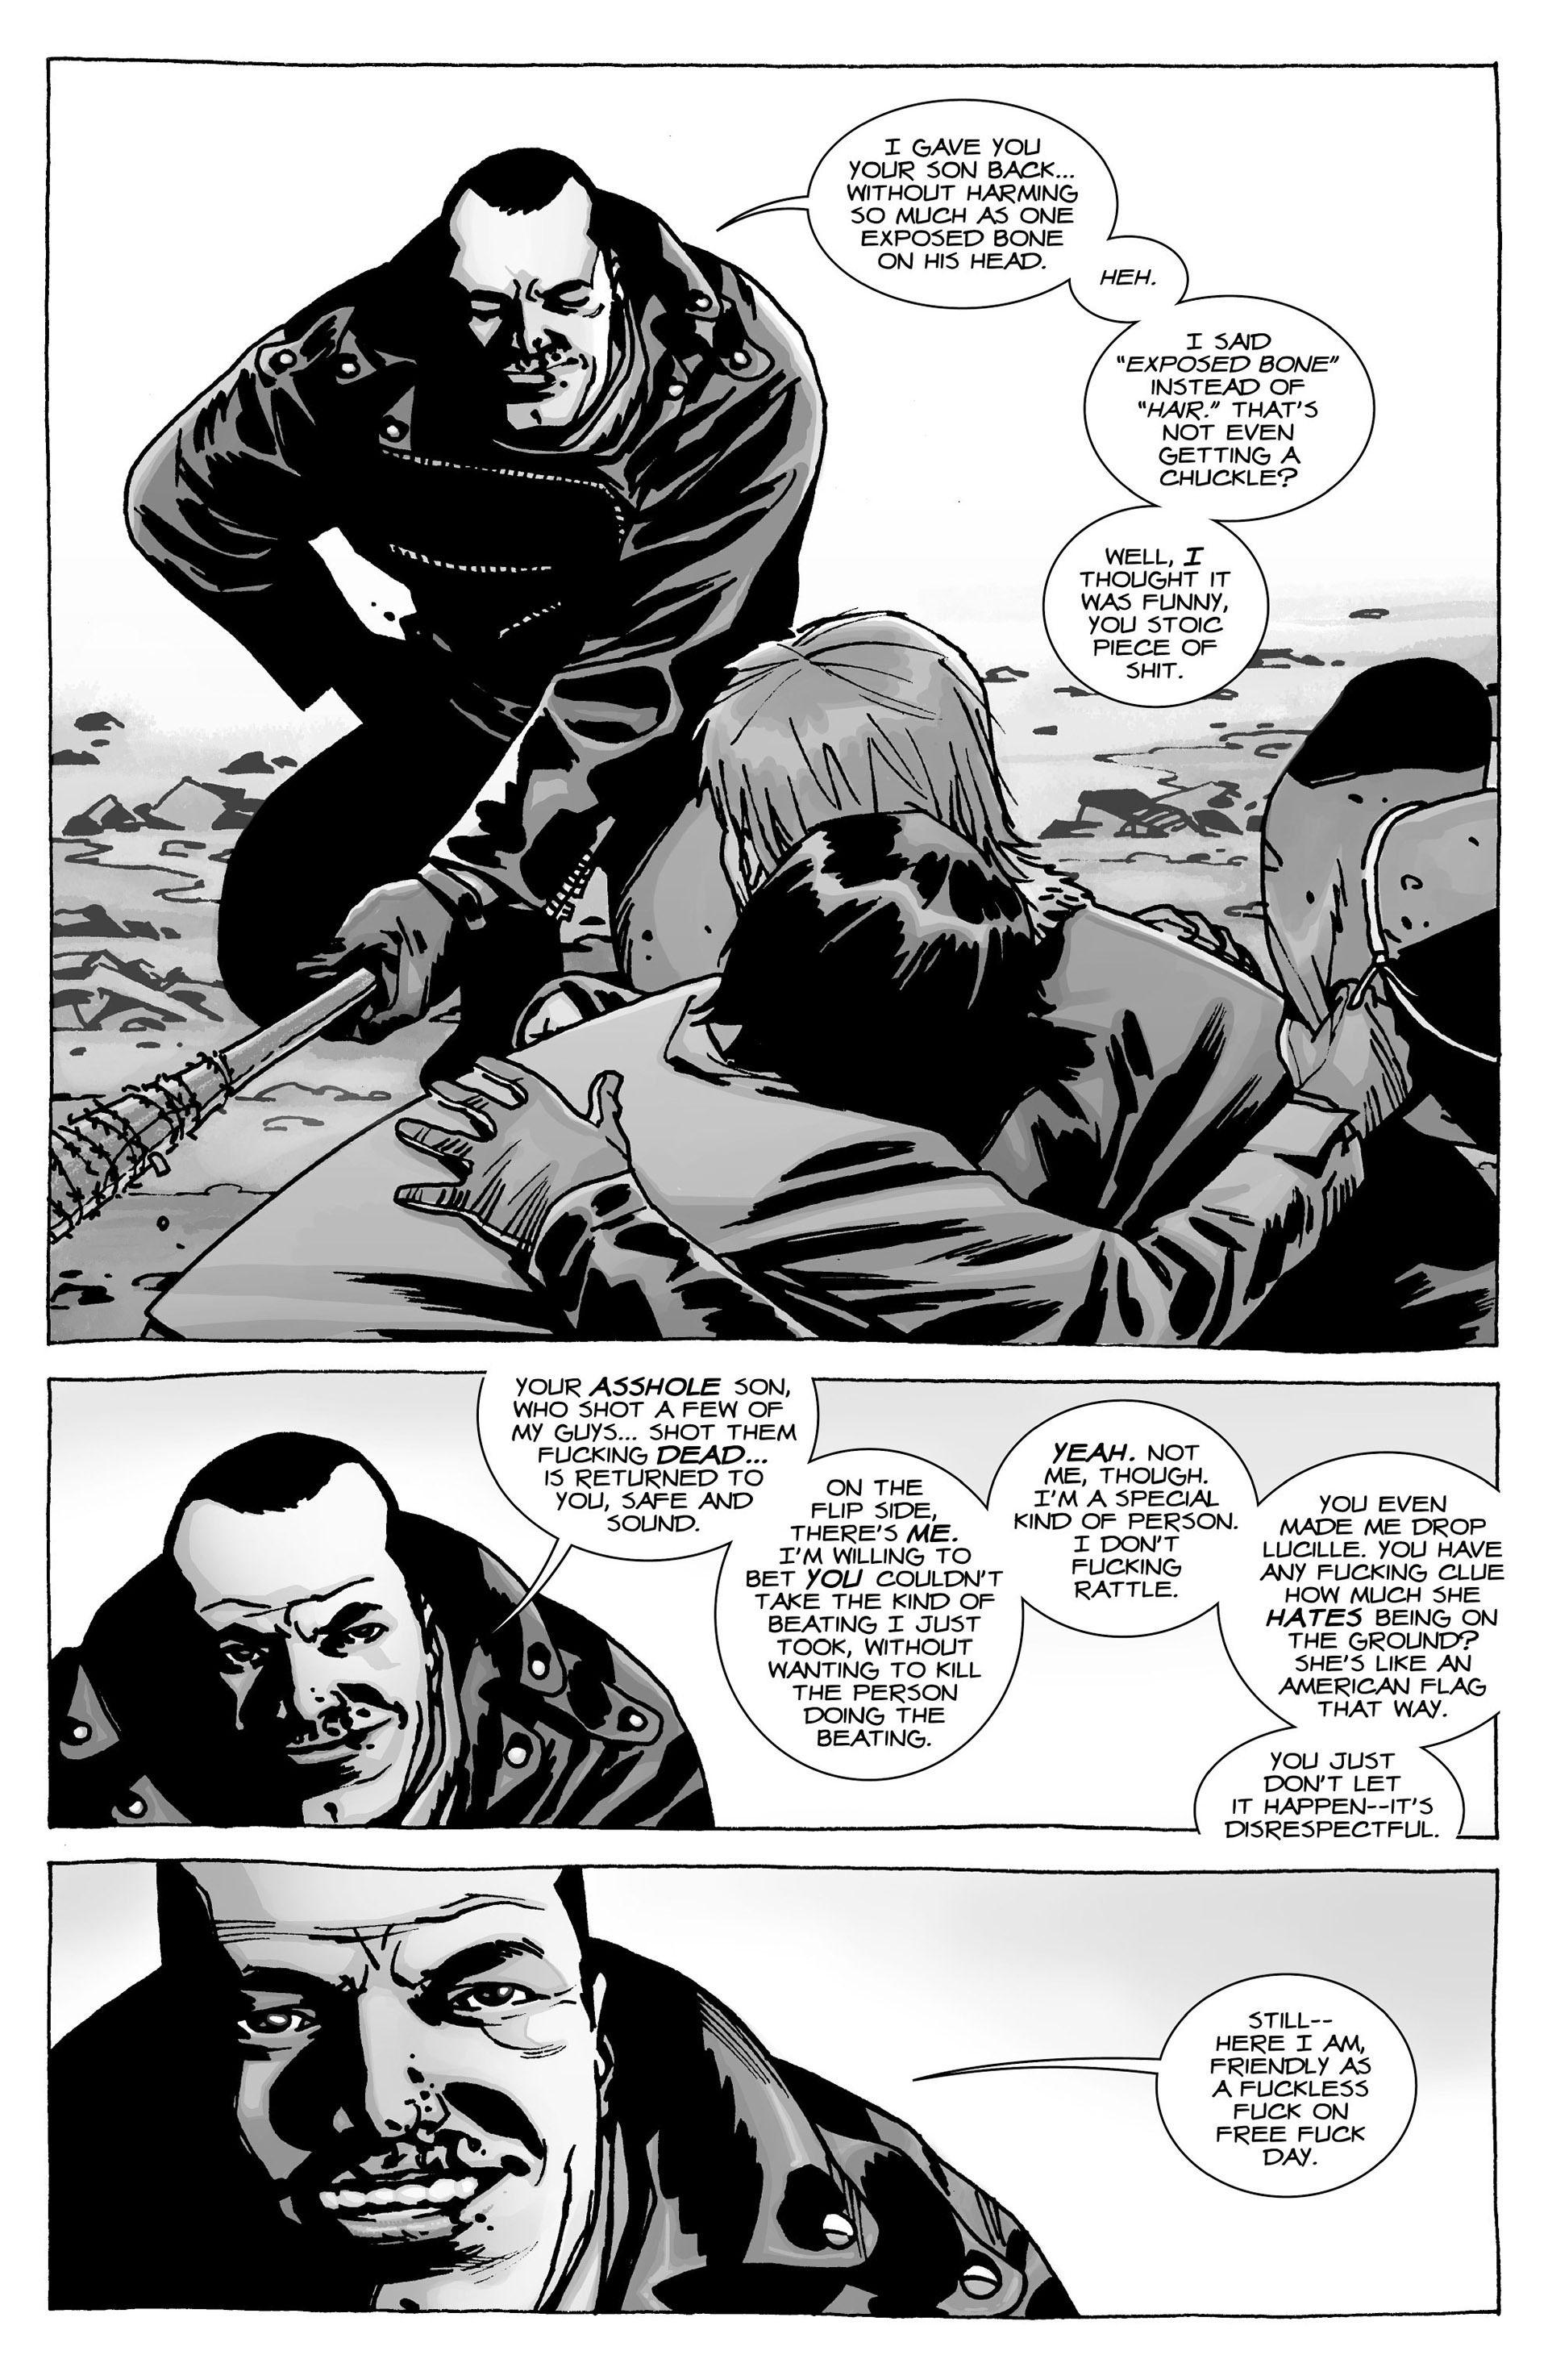 Negan can be reasonable (The Walking Dead)